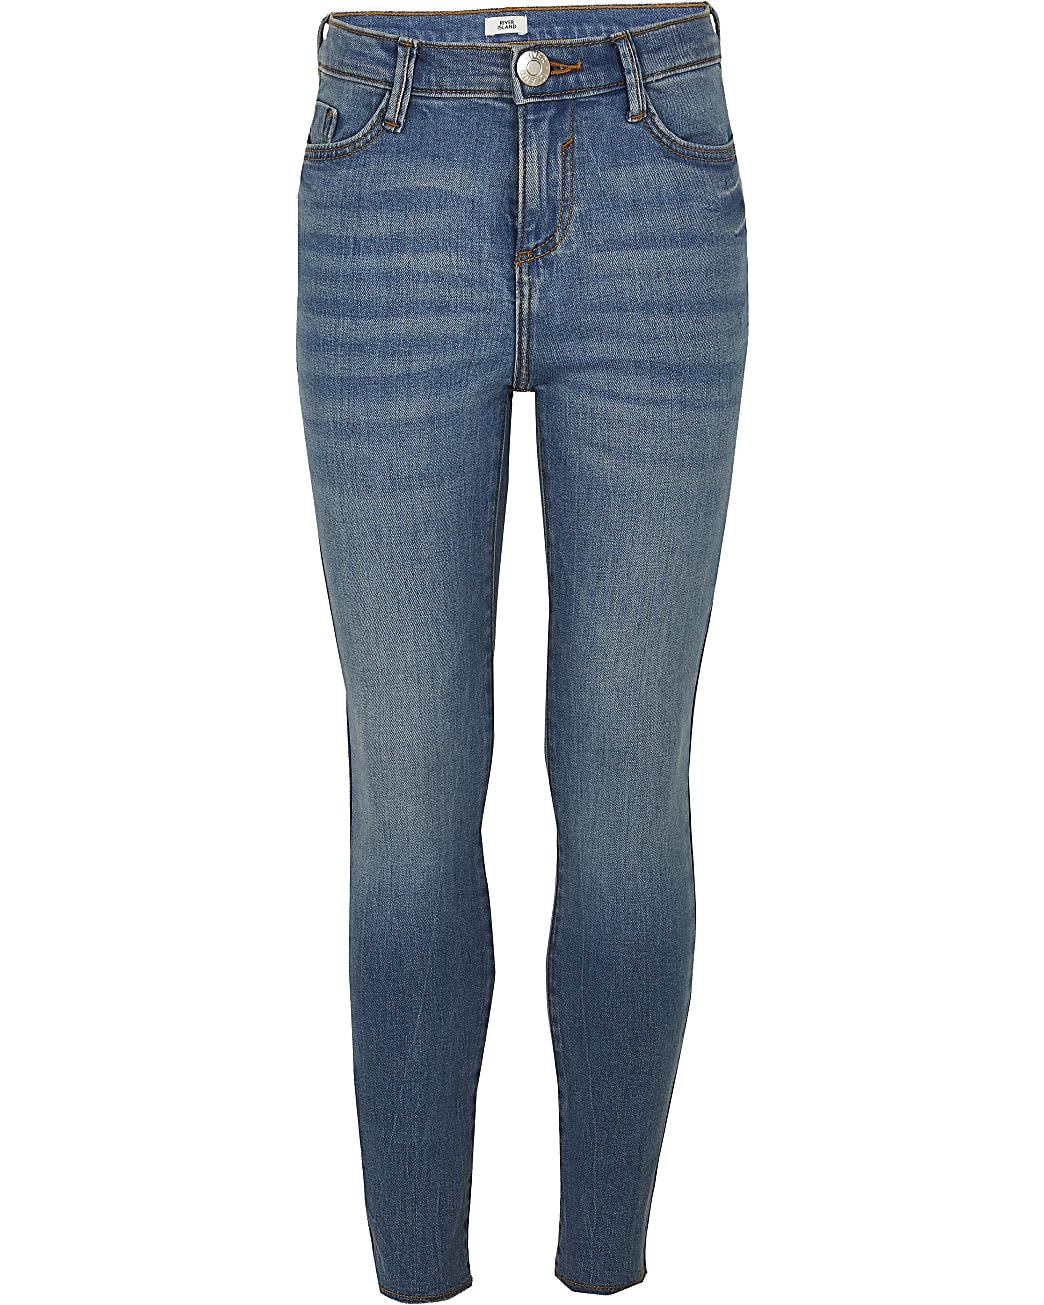 Girls blue mid rise skinny jeans